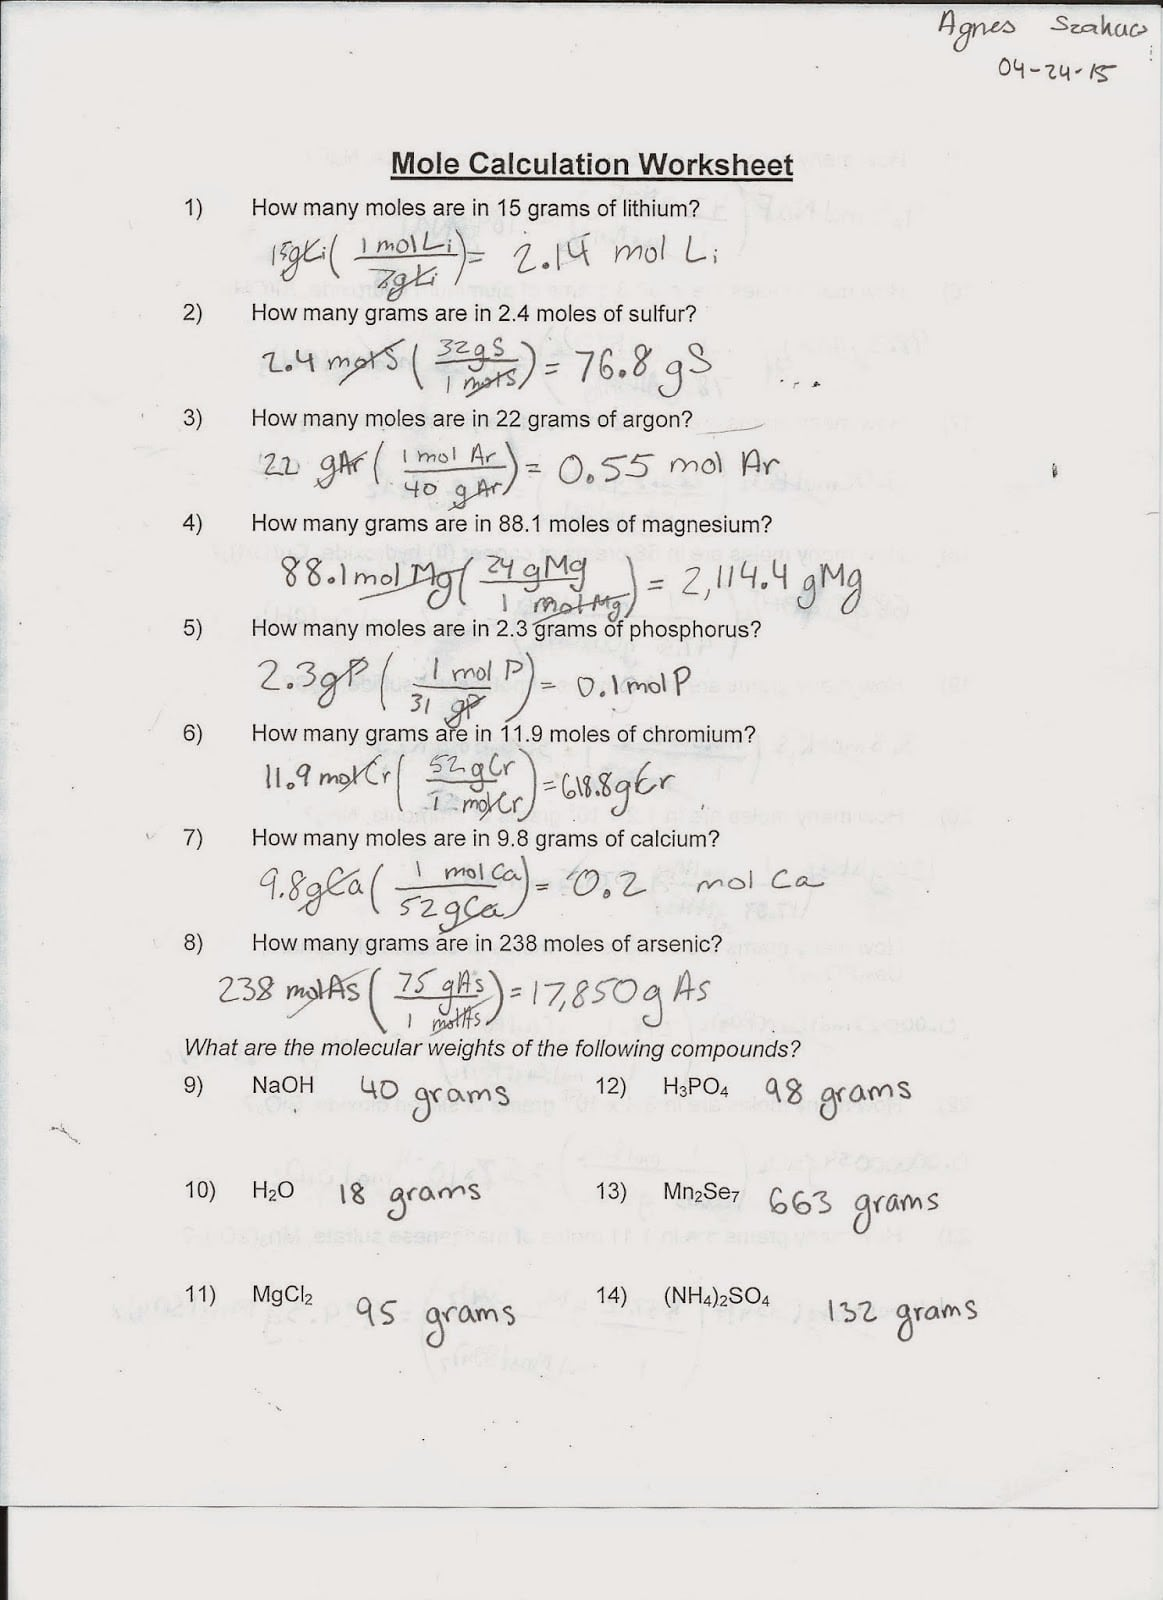 Mole Calculations Worksheet Chemfiesta